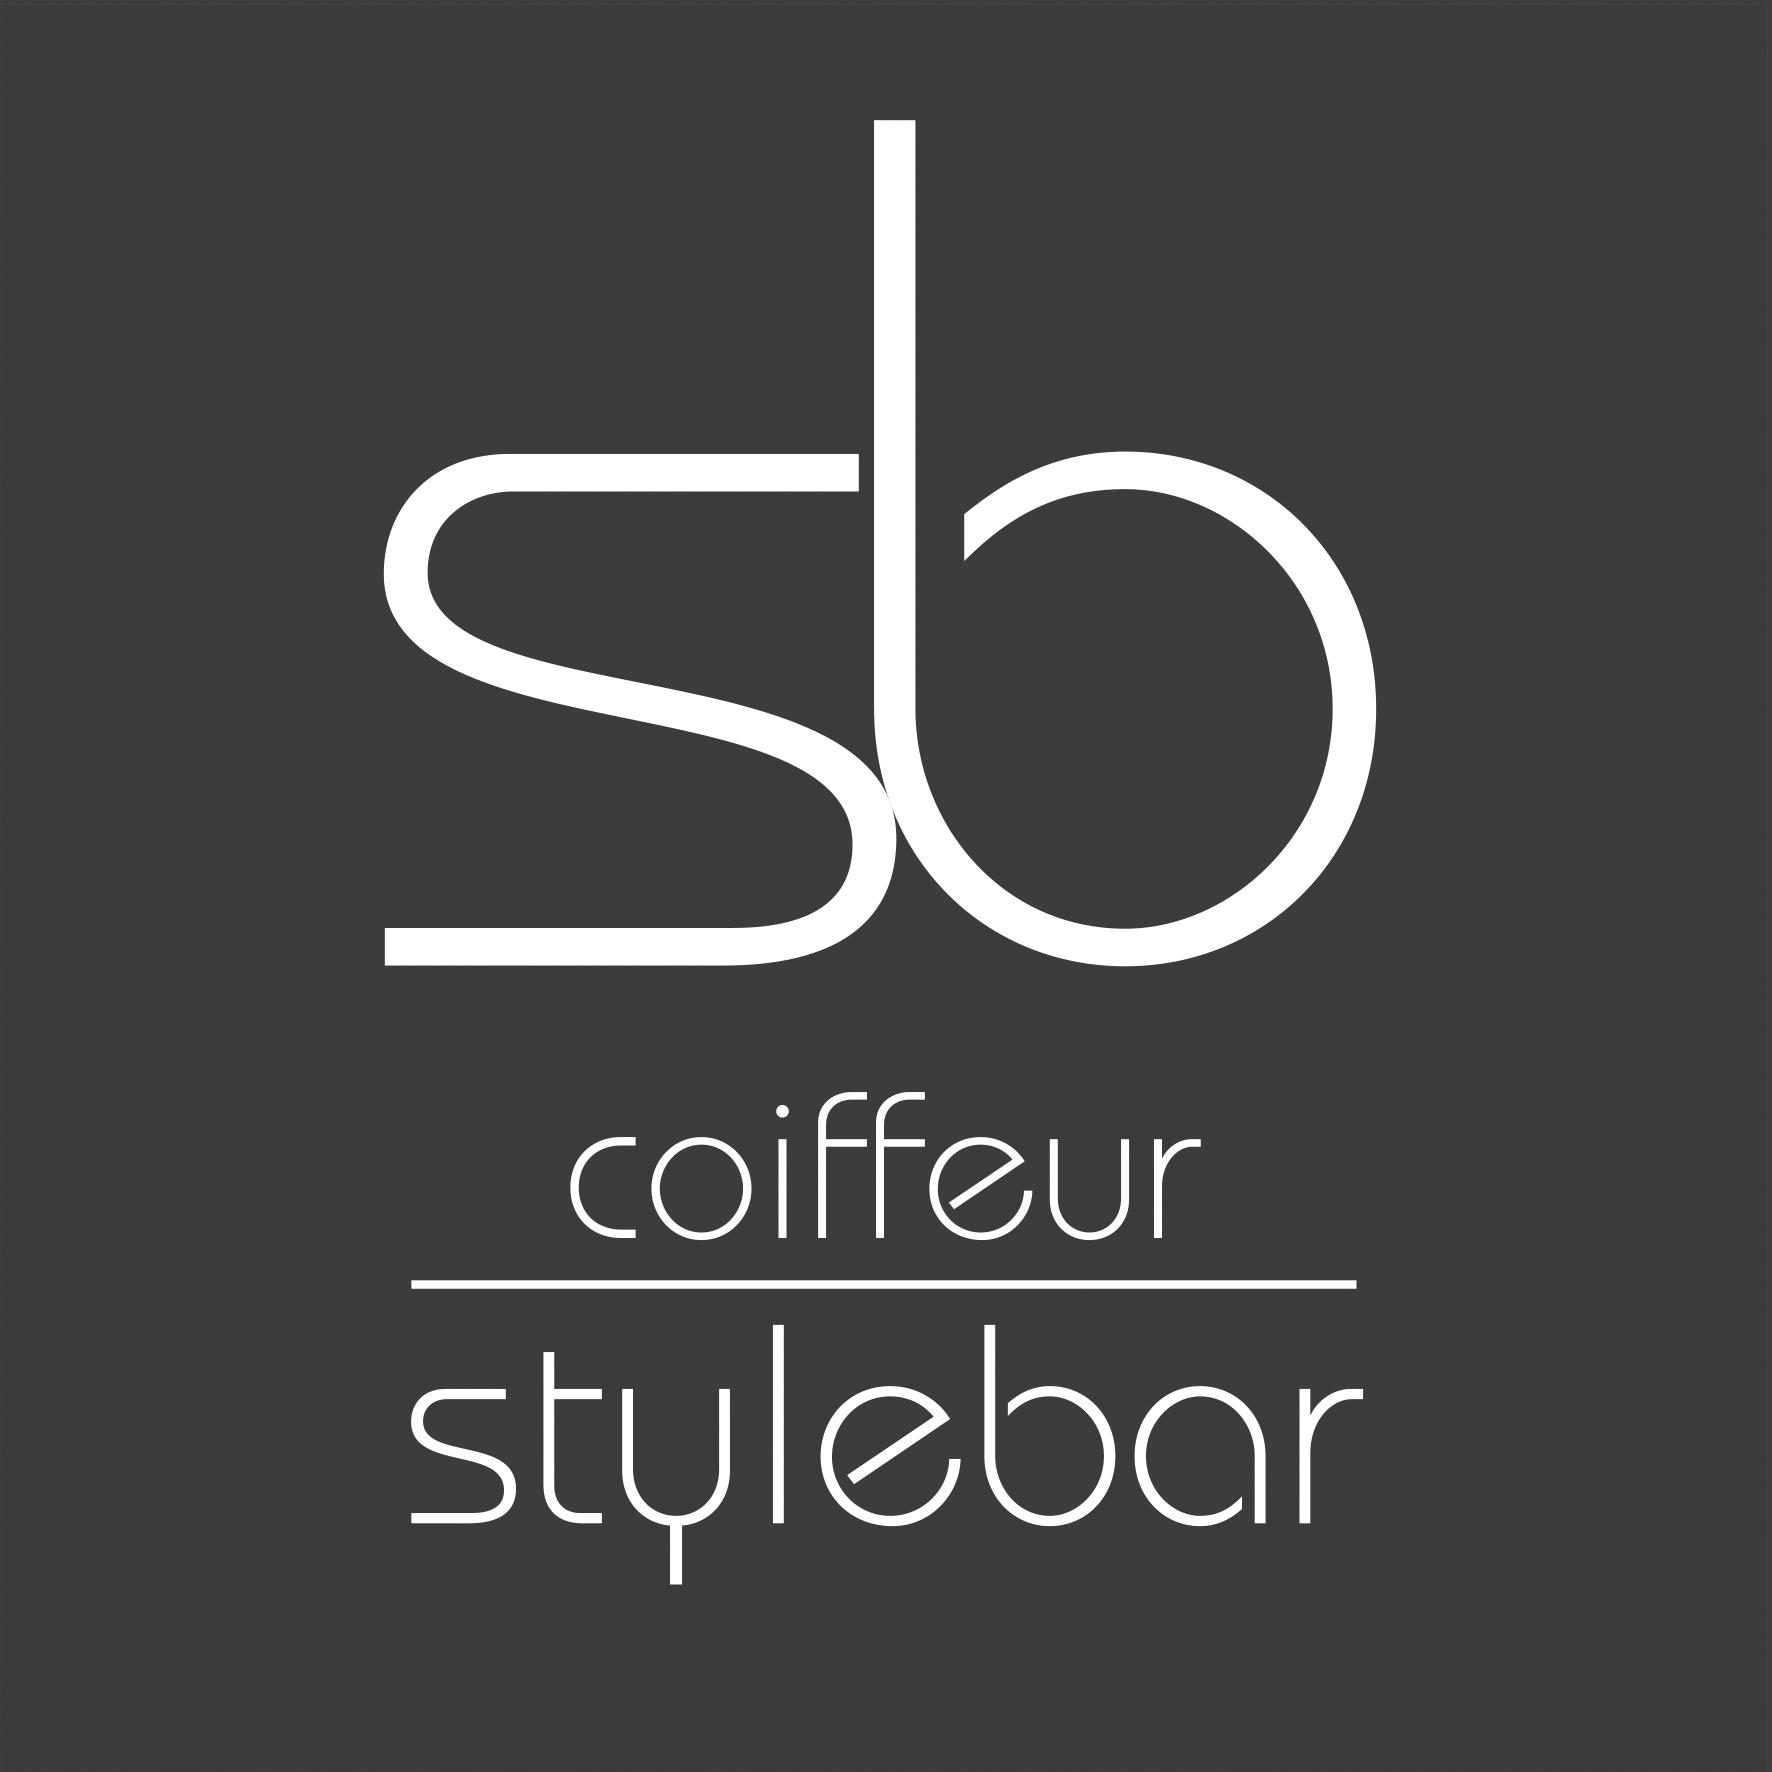 sb_stylebar_bb_K78